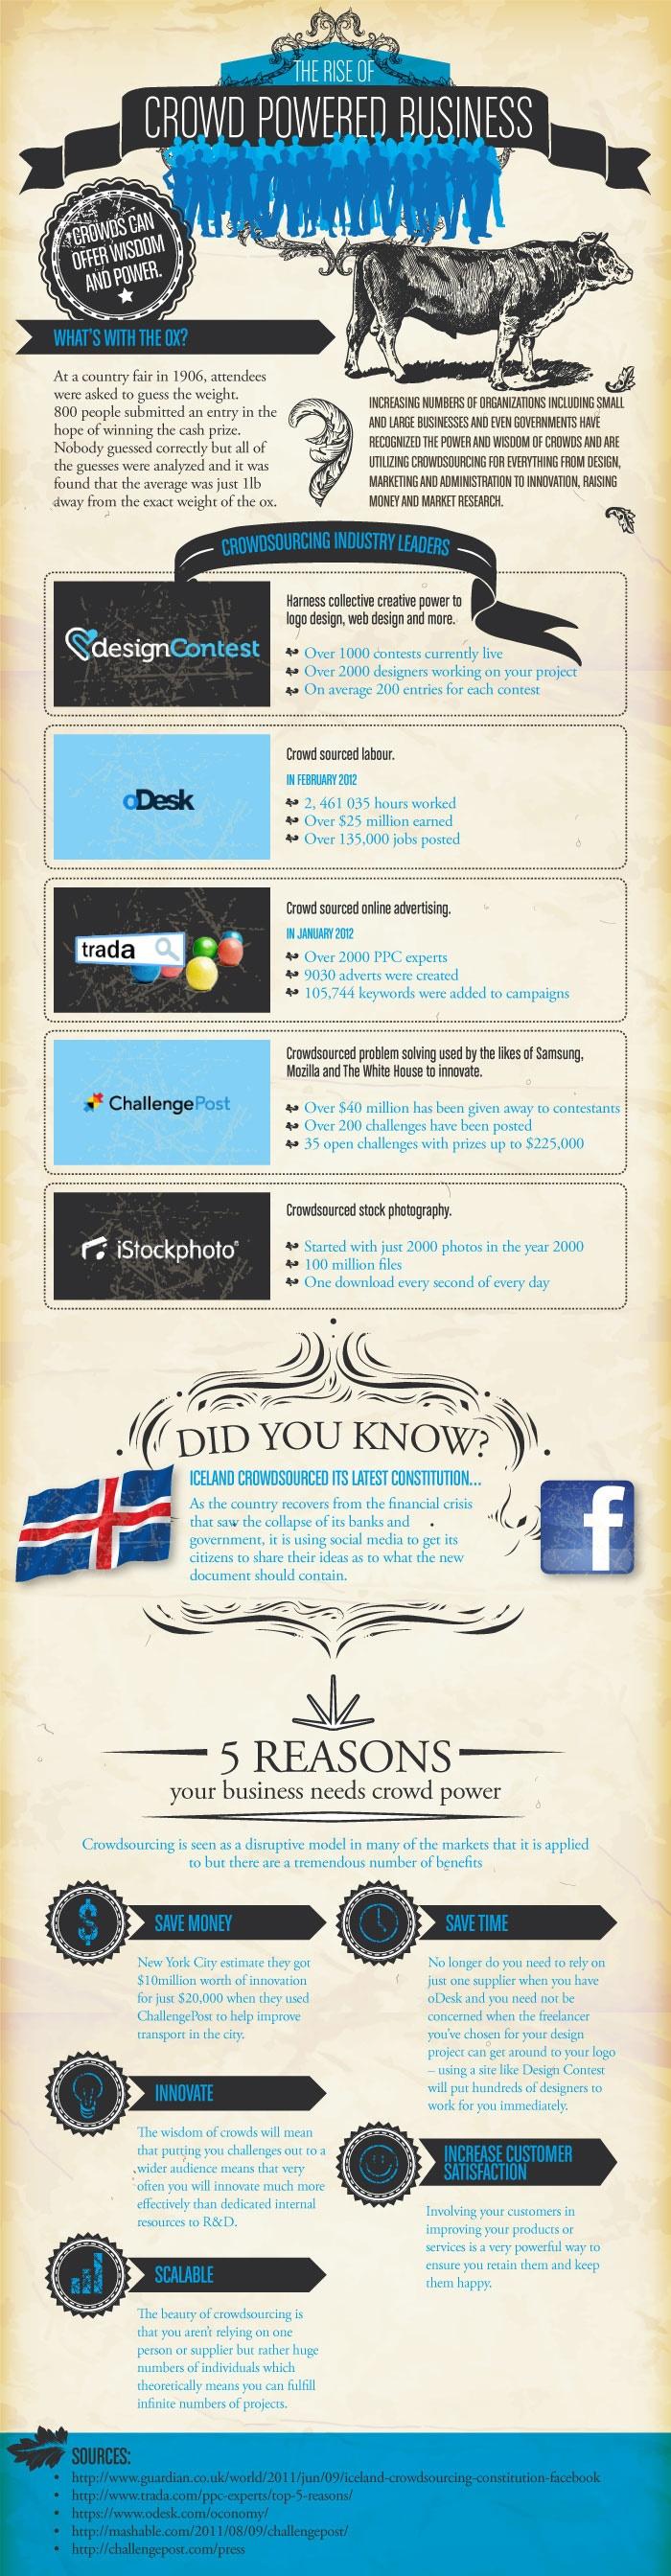 Important-Crowdsourcing-Sites